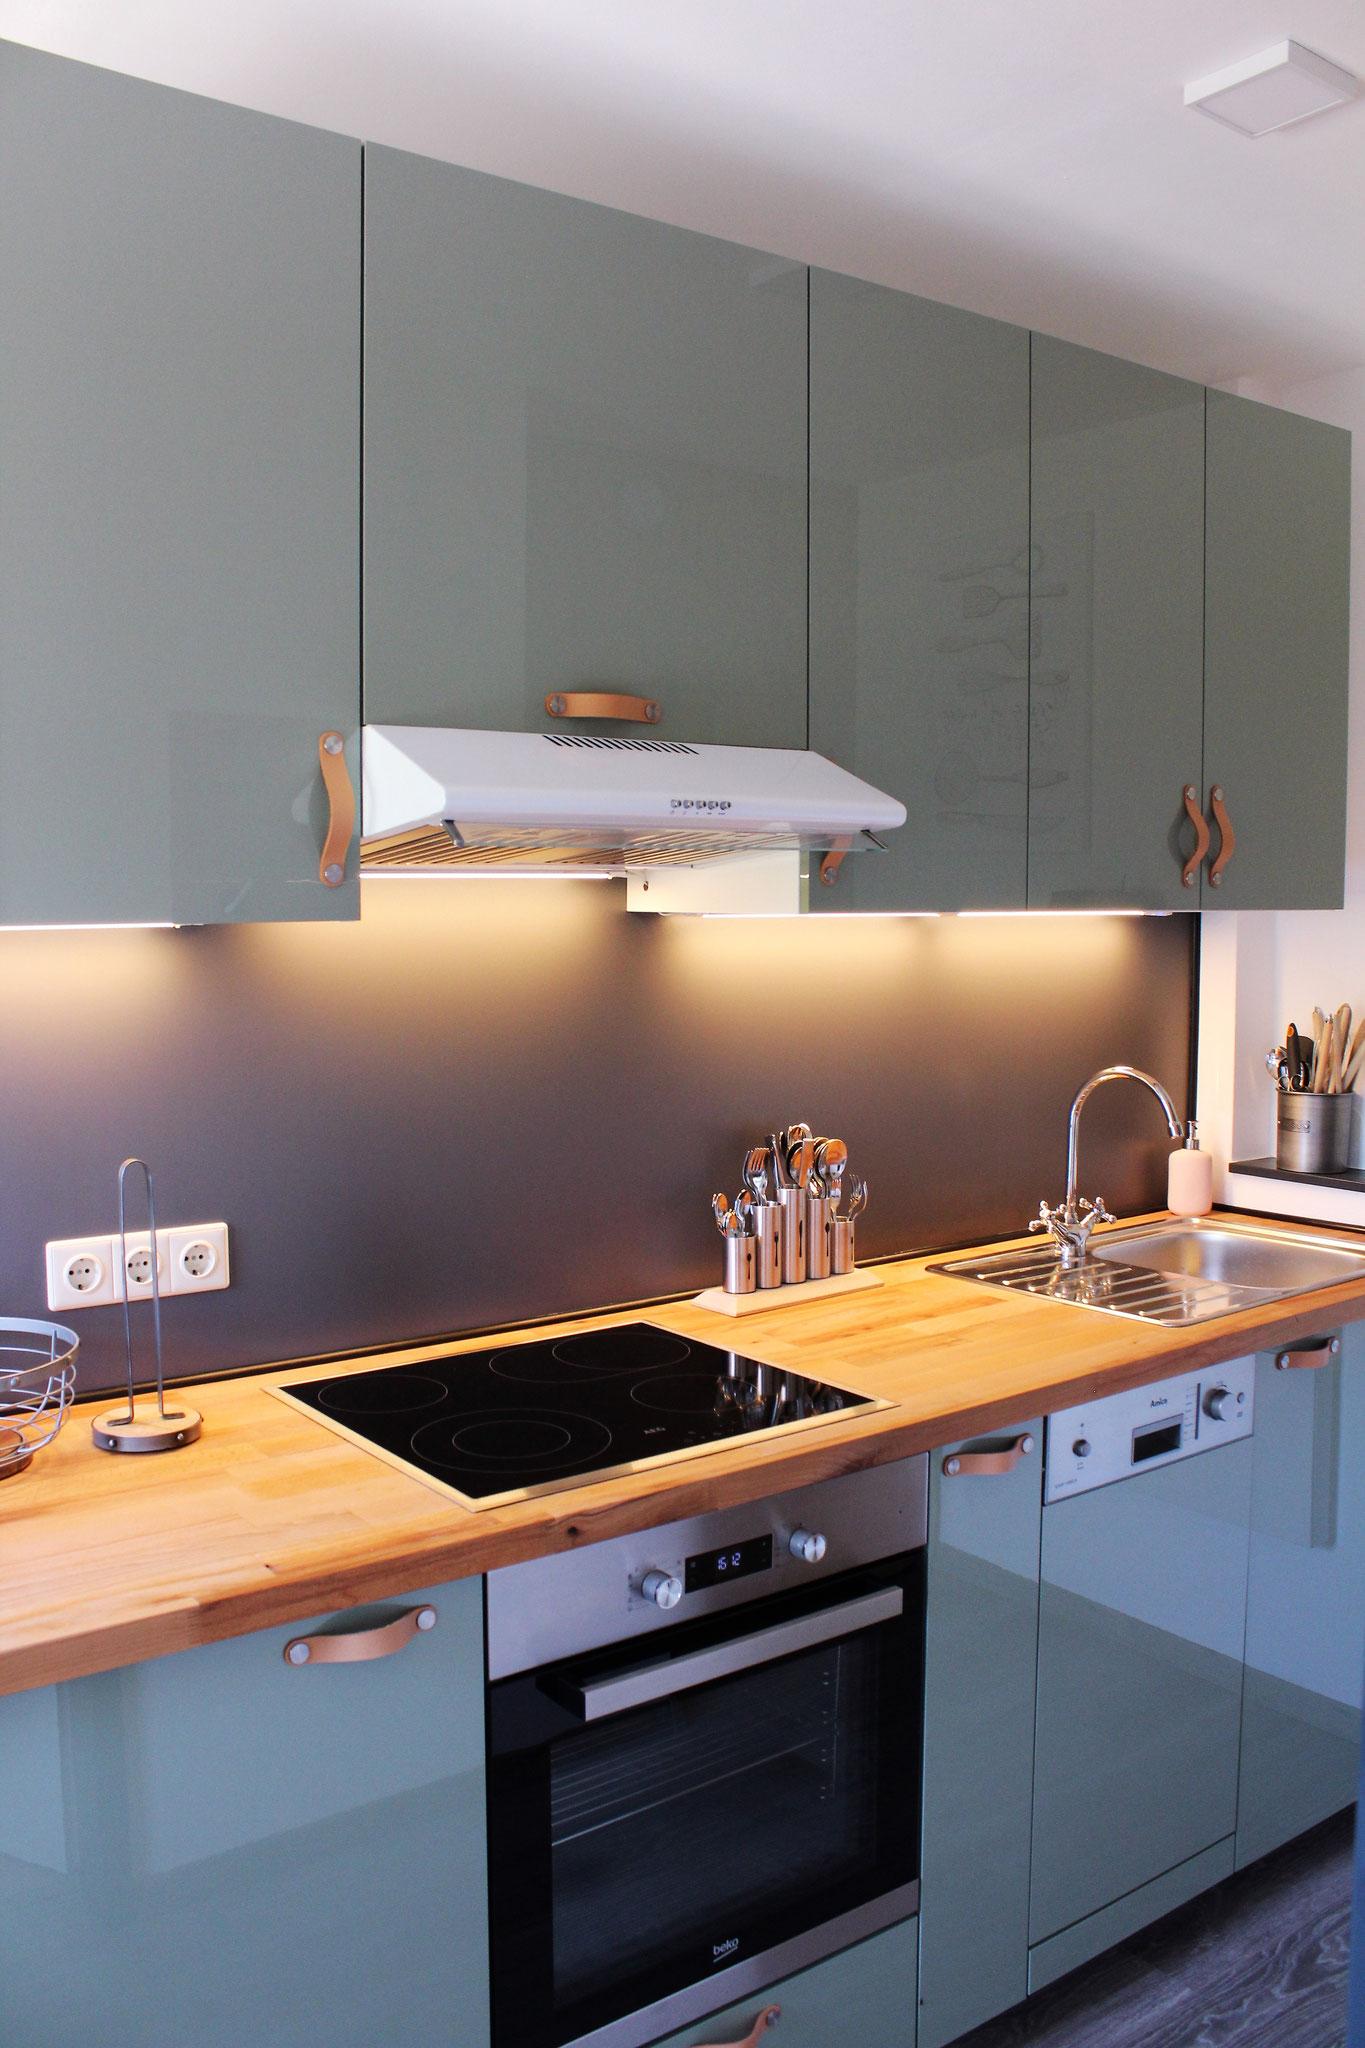 Küche ©KnallerbsenHof